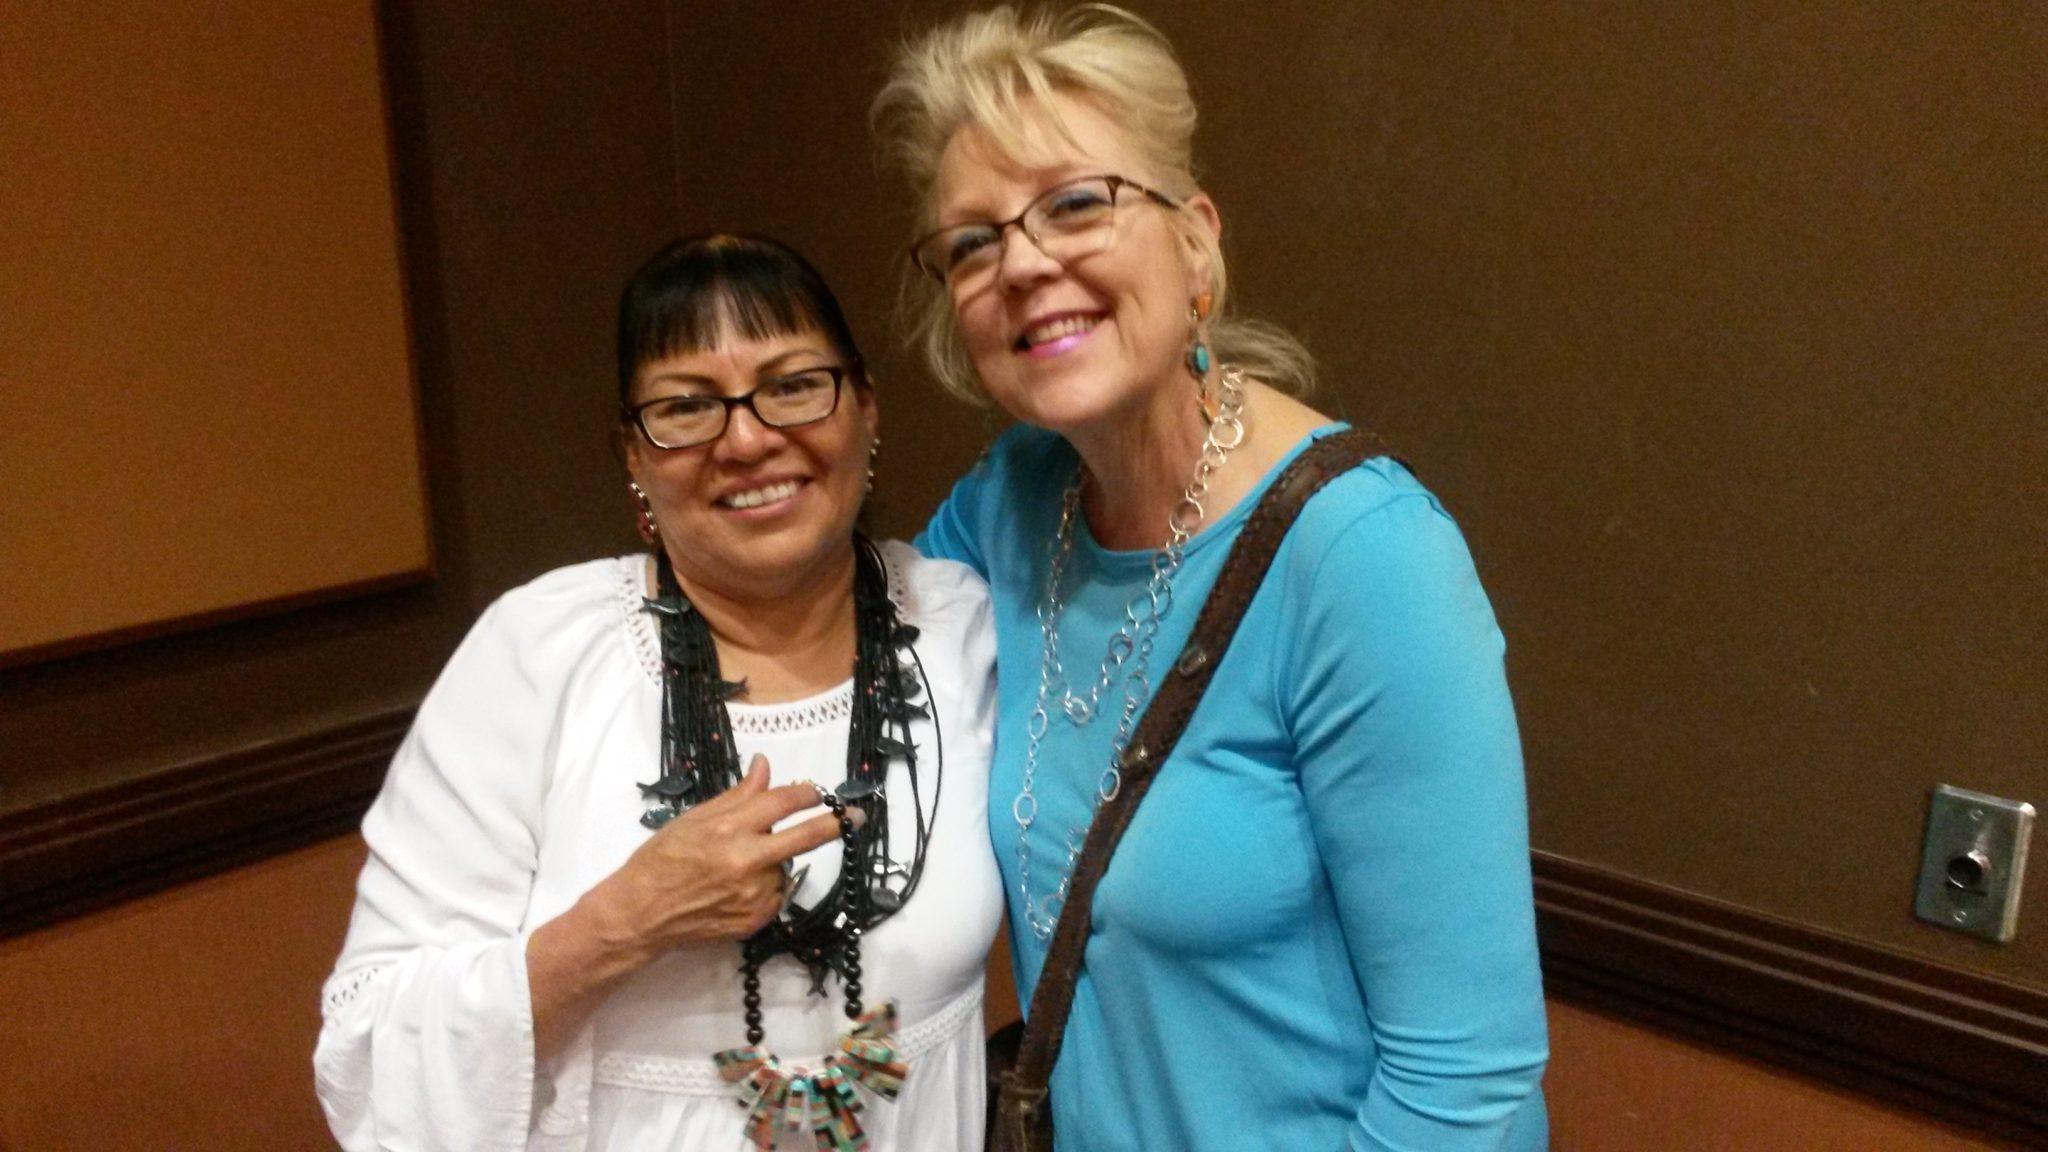 Jolene Bird with Tucson Indian Jewelry's Christy